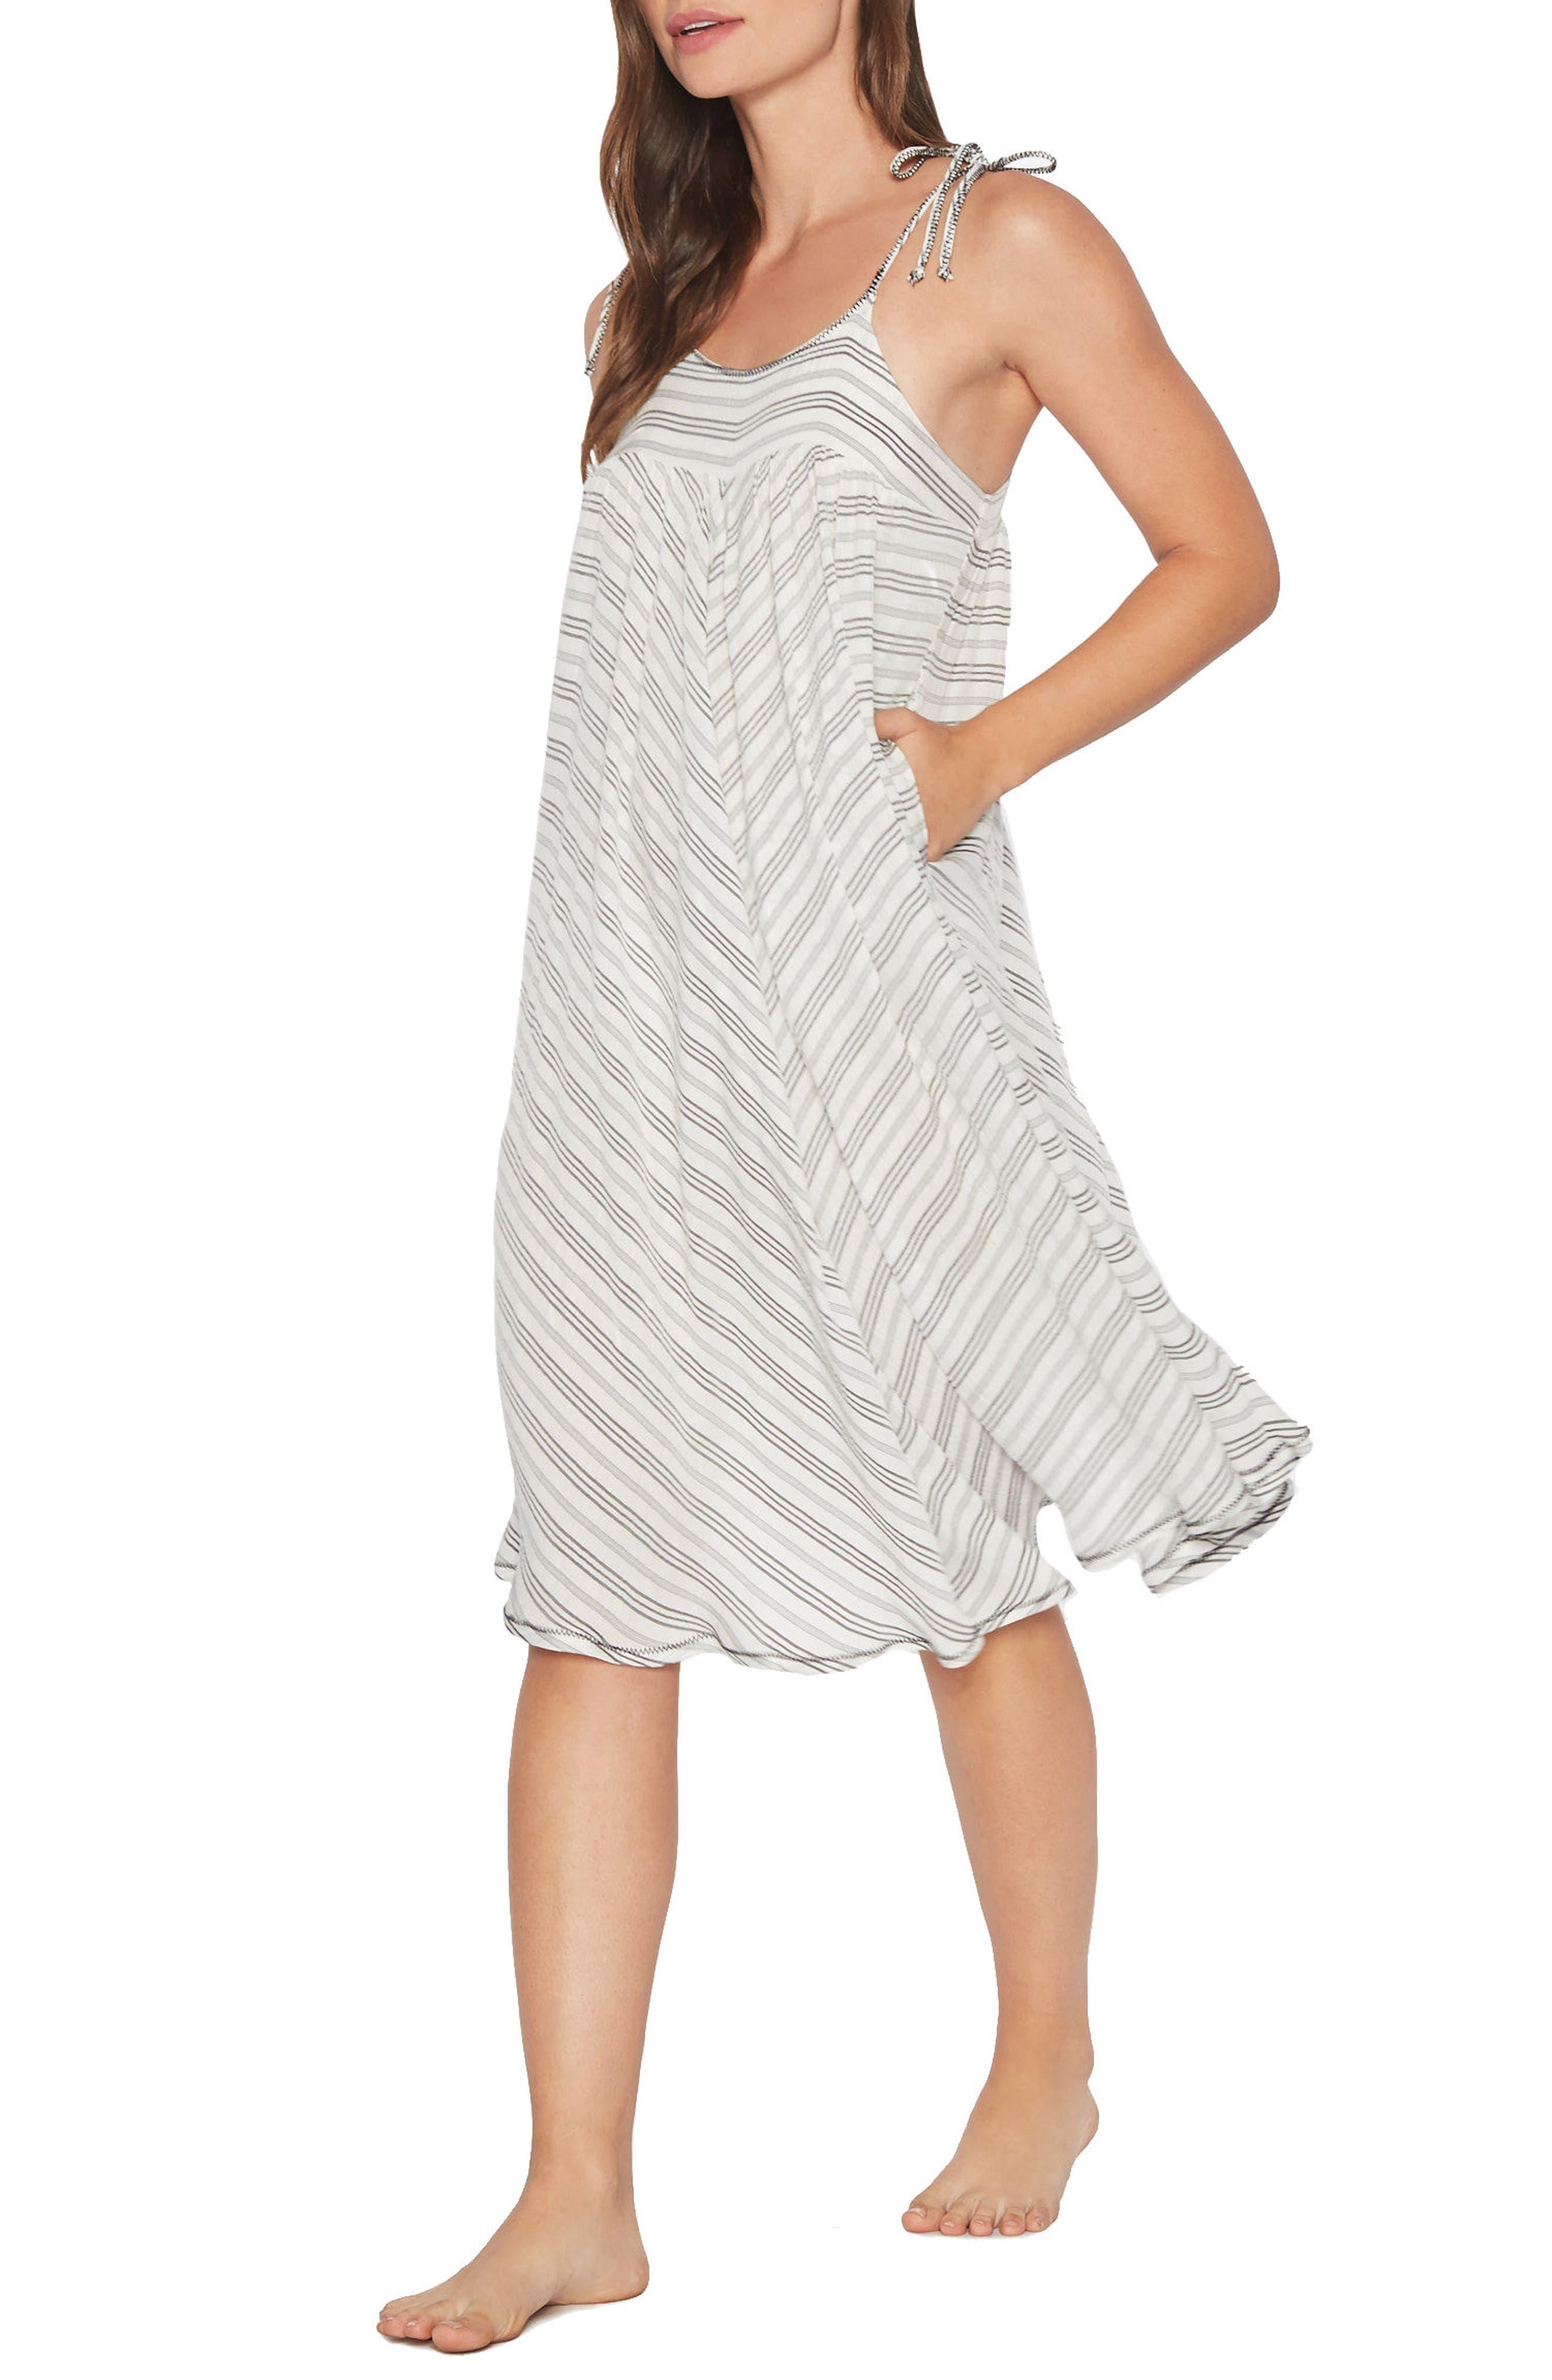 Norah Stripe Cover-Up Dress,                             Main thumbnail 1, color,                             023